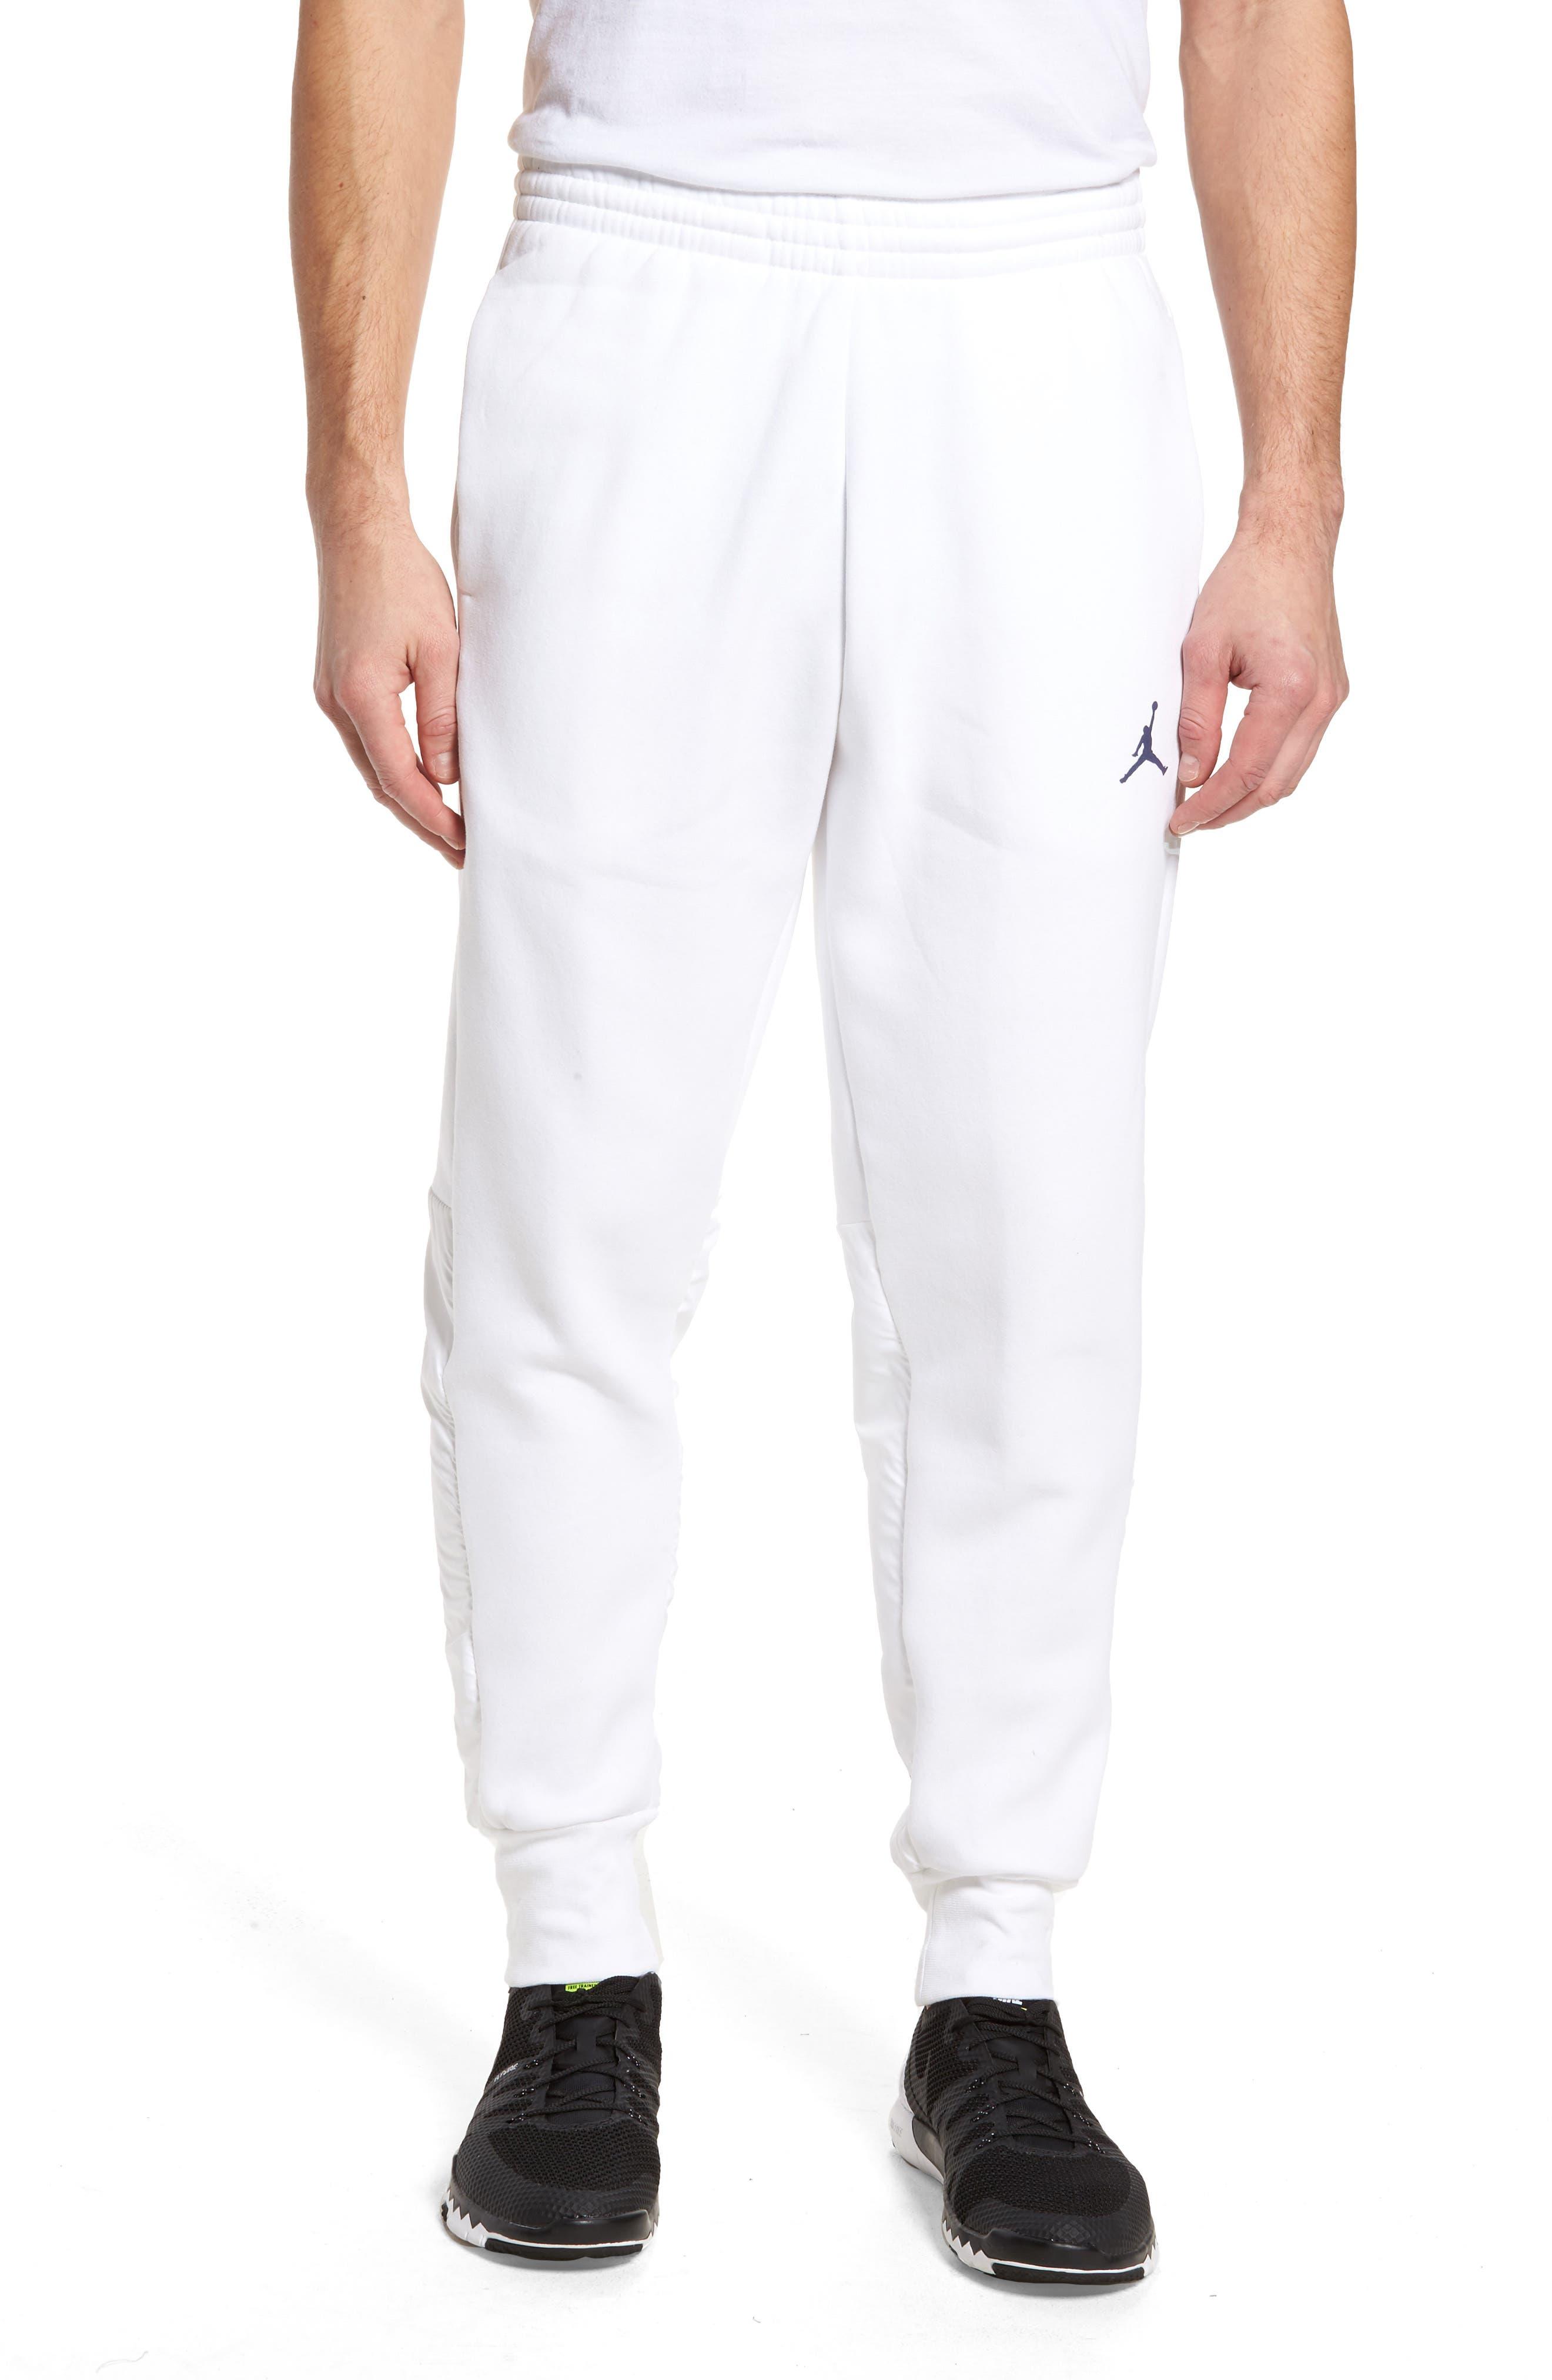 Jordan AJ11 Hybrid Pants